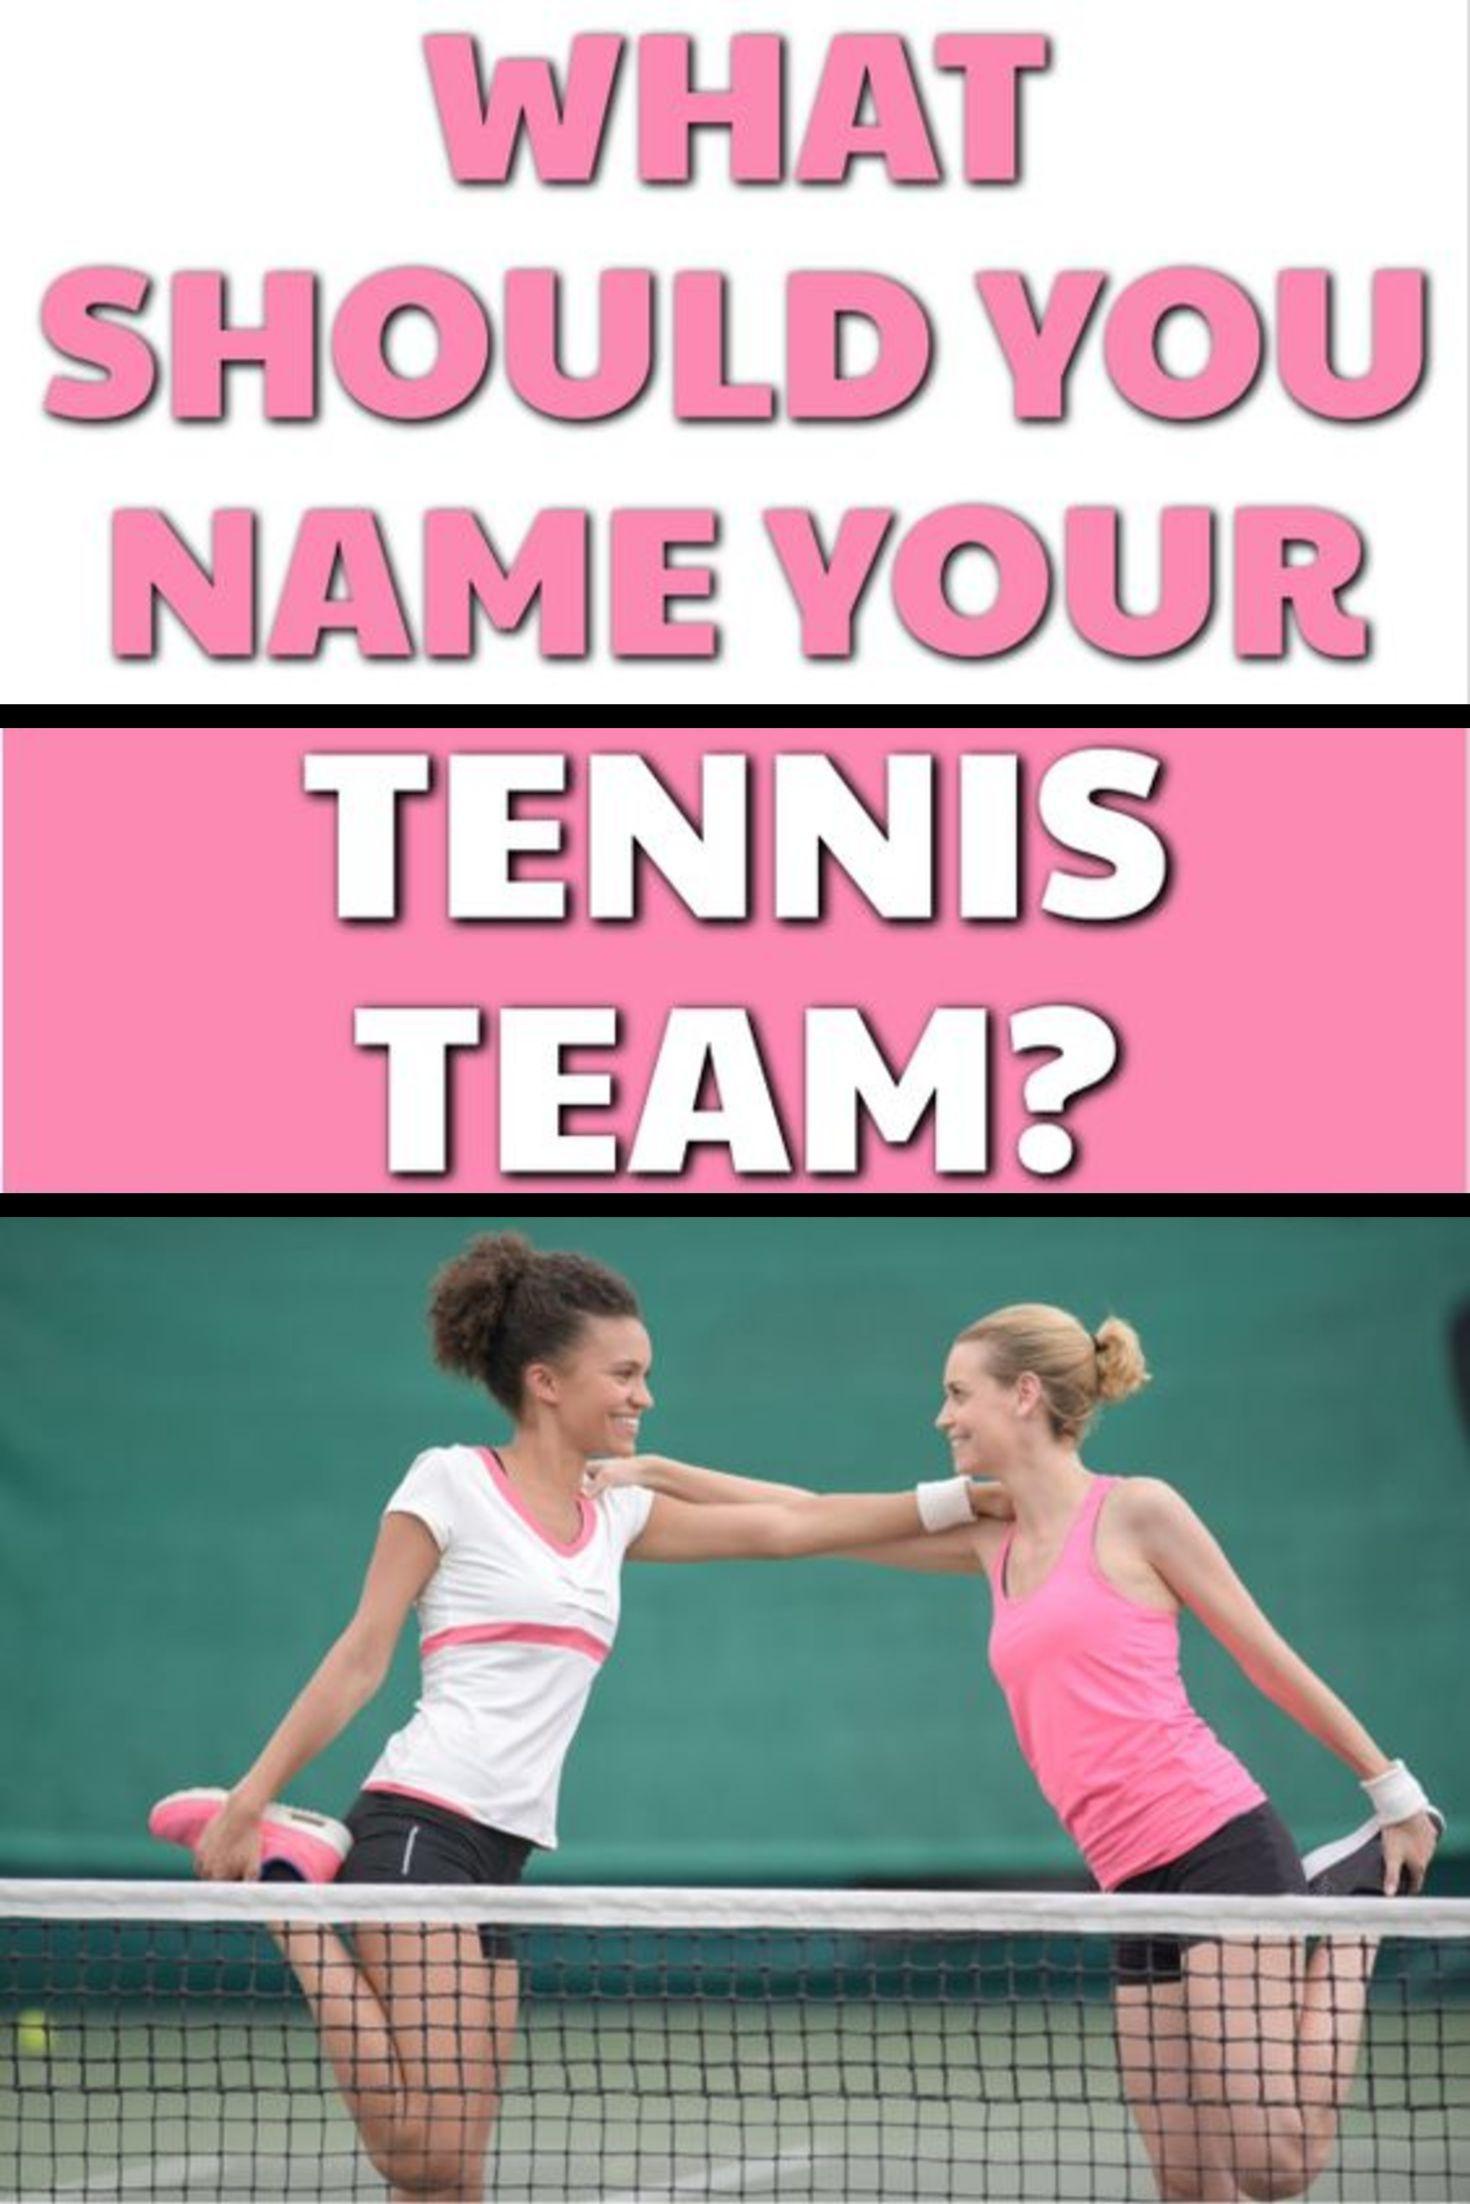 Funny Tennis Team Names In 2020 Tennis Team Team Names Play Tennis